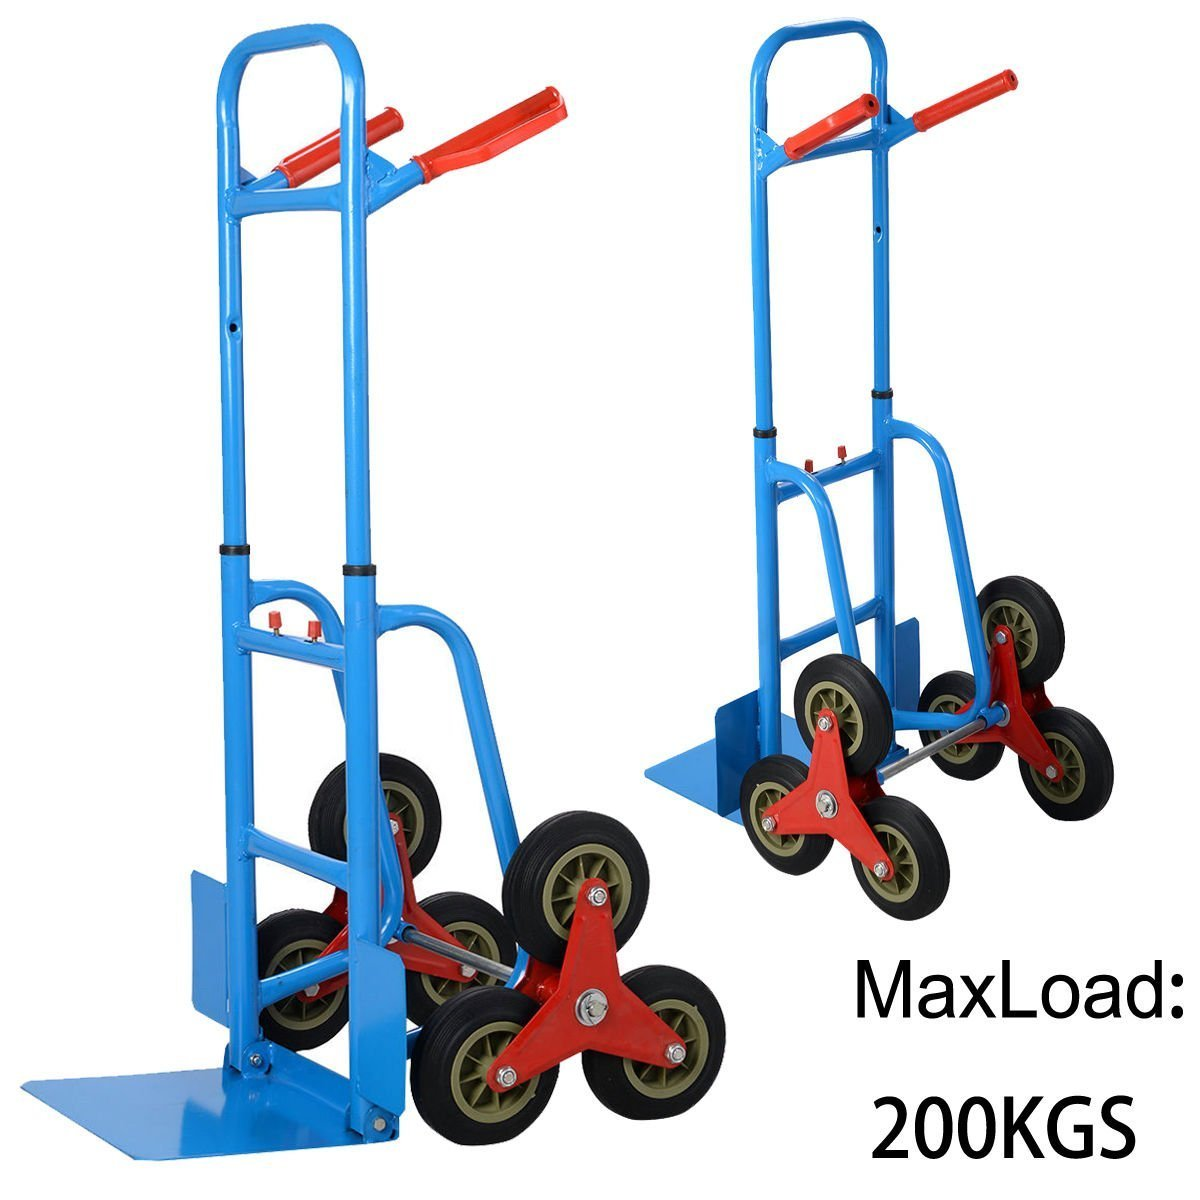 Costway Heavy Duty Hand Truck Sack Trolley Stair Climber Cart Flat 6 Wheel 200kg Capacity